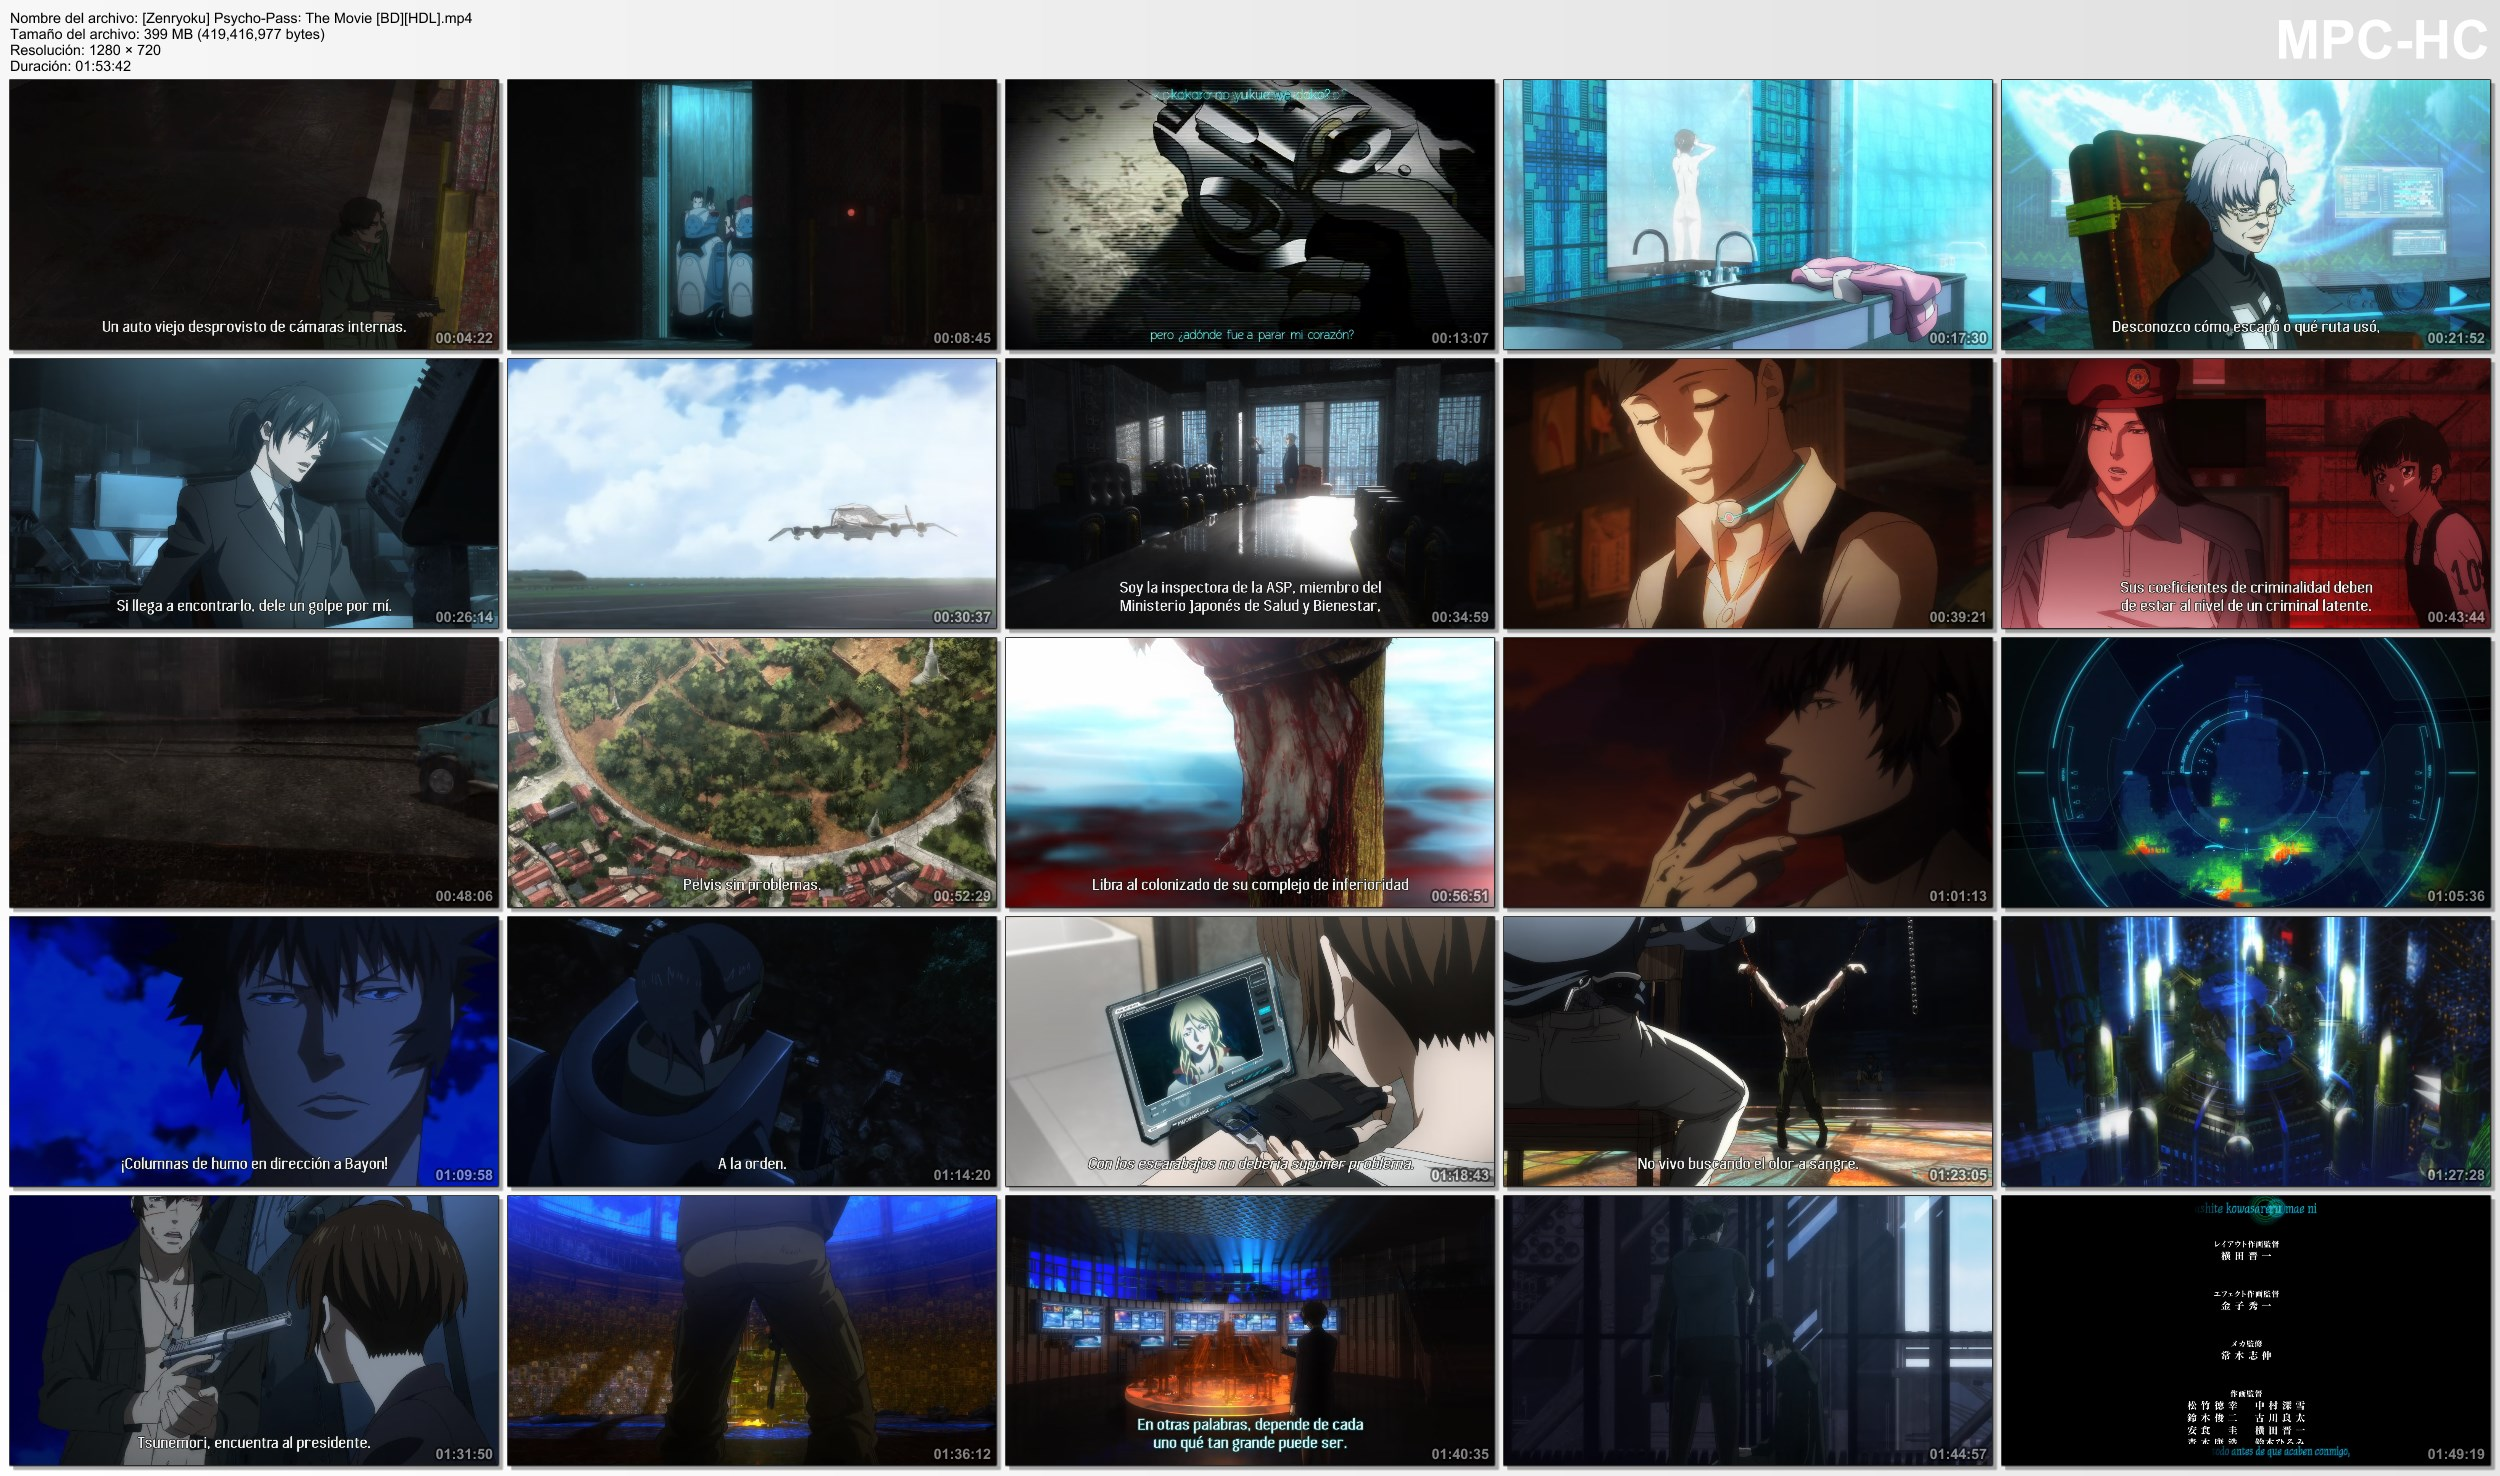 NjKDLzwrg5pDZ - [Aporte] Psycho-Pass: The Movie [Pelicula][BD-720p][400Mb][MEGA] - Anime Ligero [Descargas]